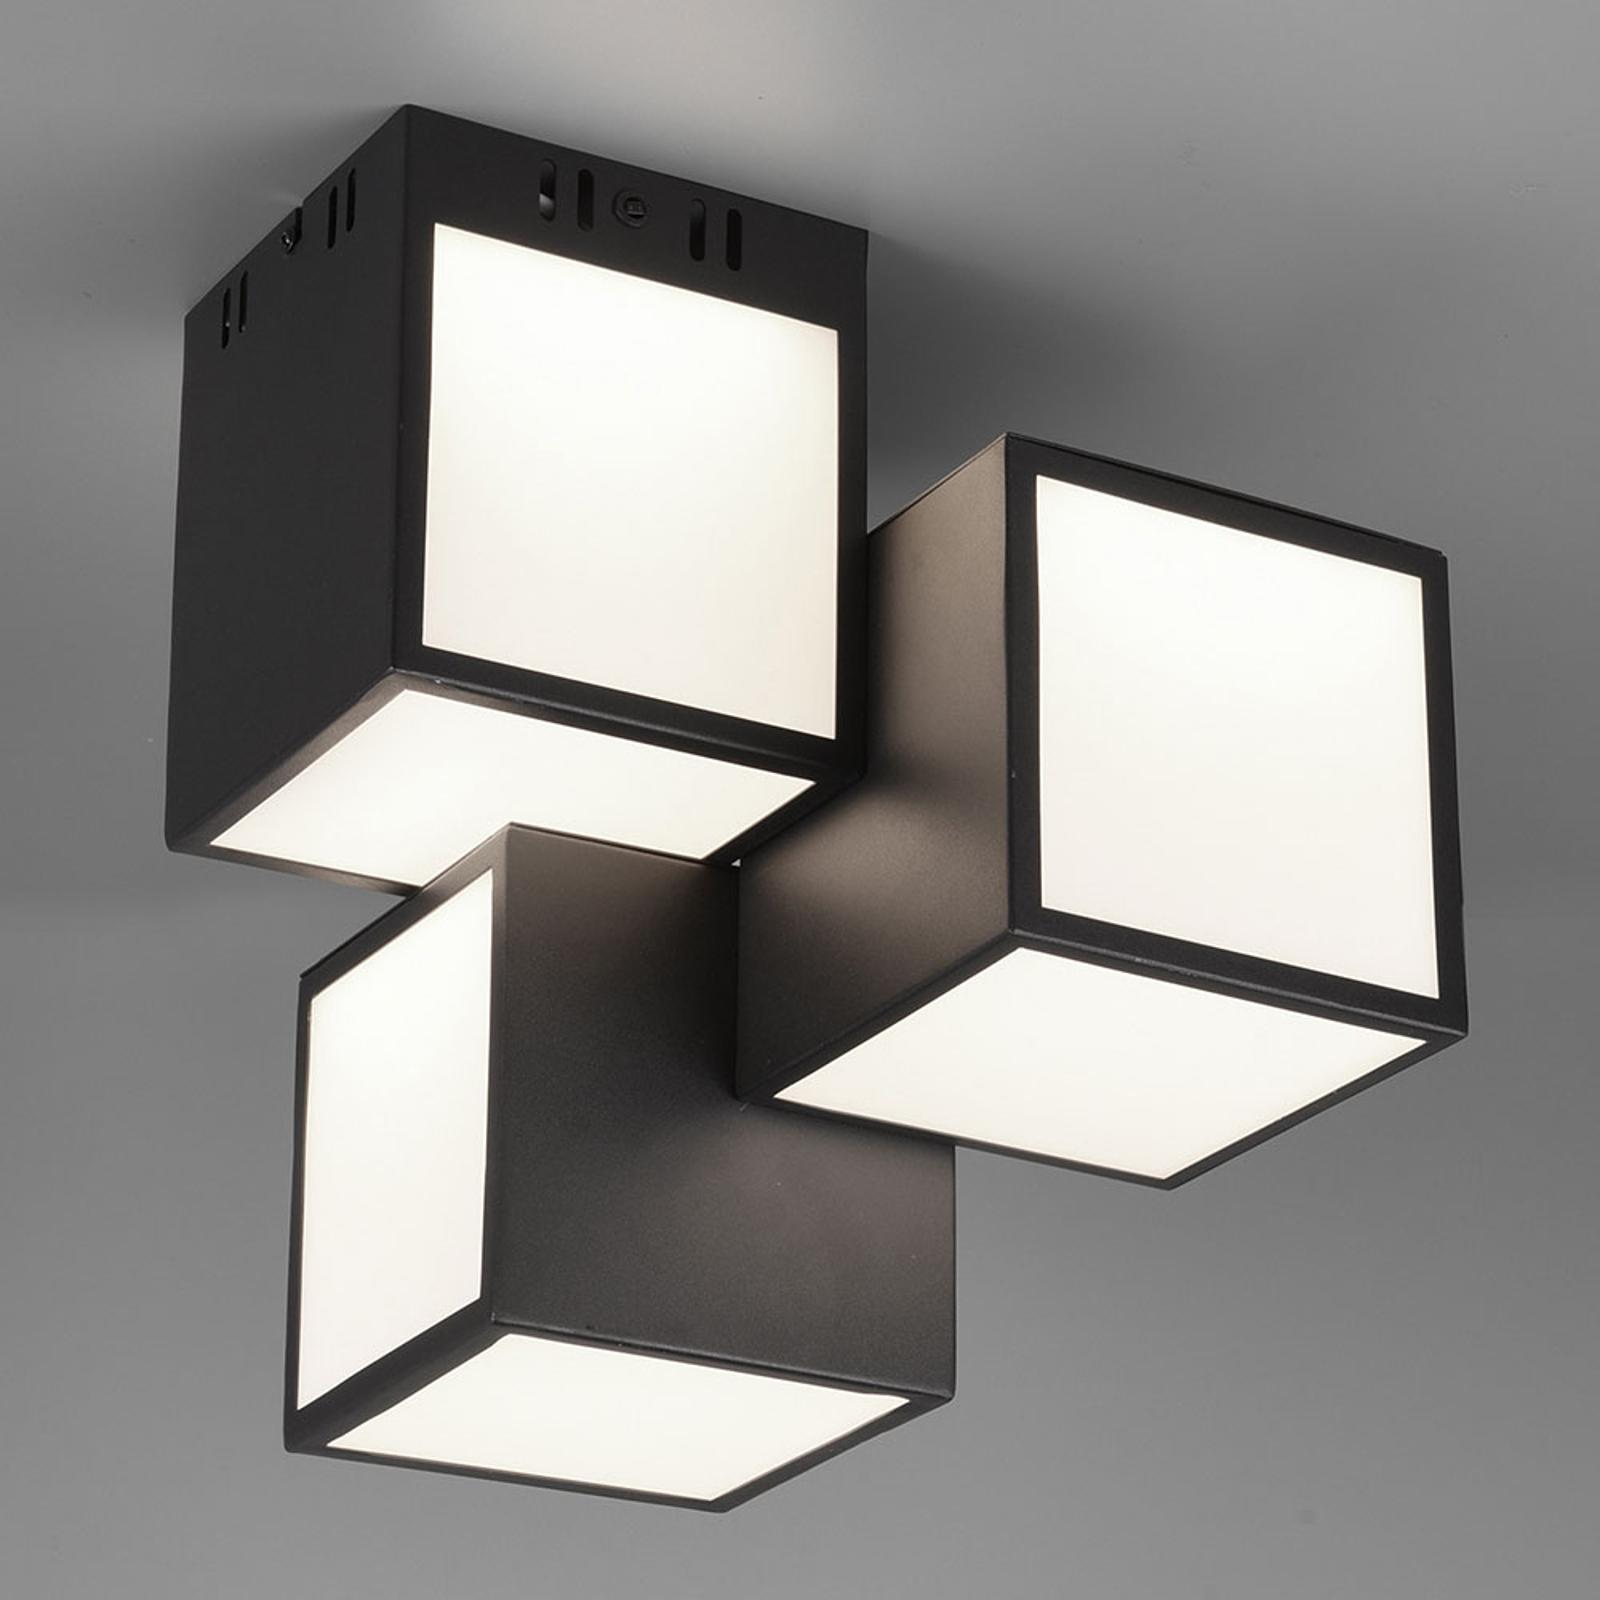 Trio WiZ Oscar LED-loftlampe, 30x30 cm, sort